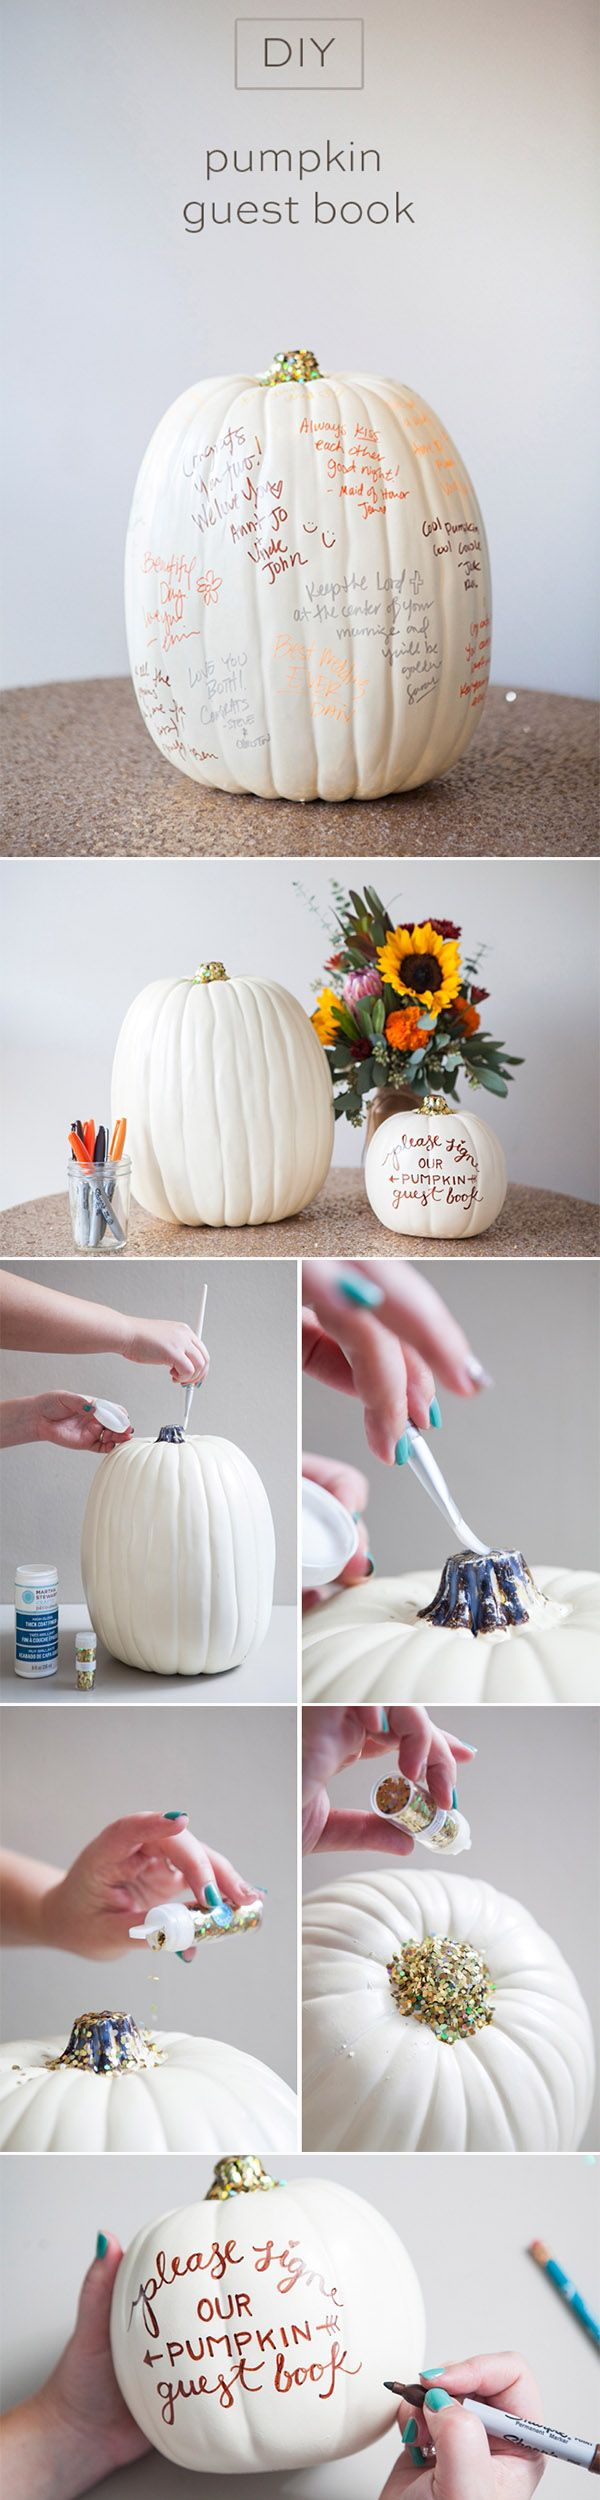 diy pumpkin wedding guest book for fall wedding ideas